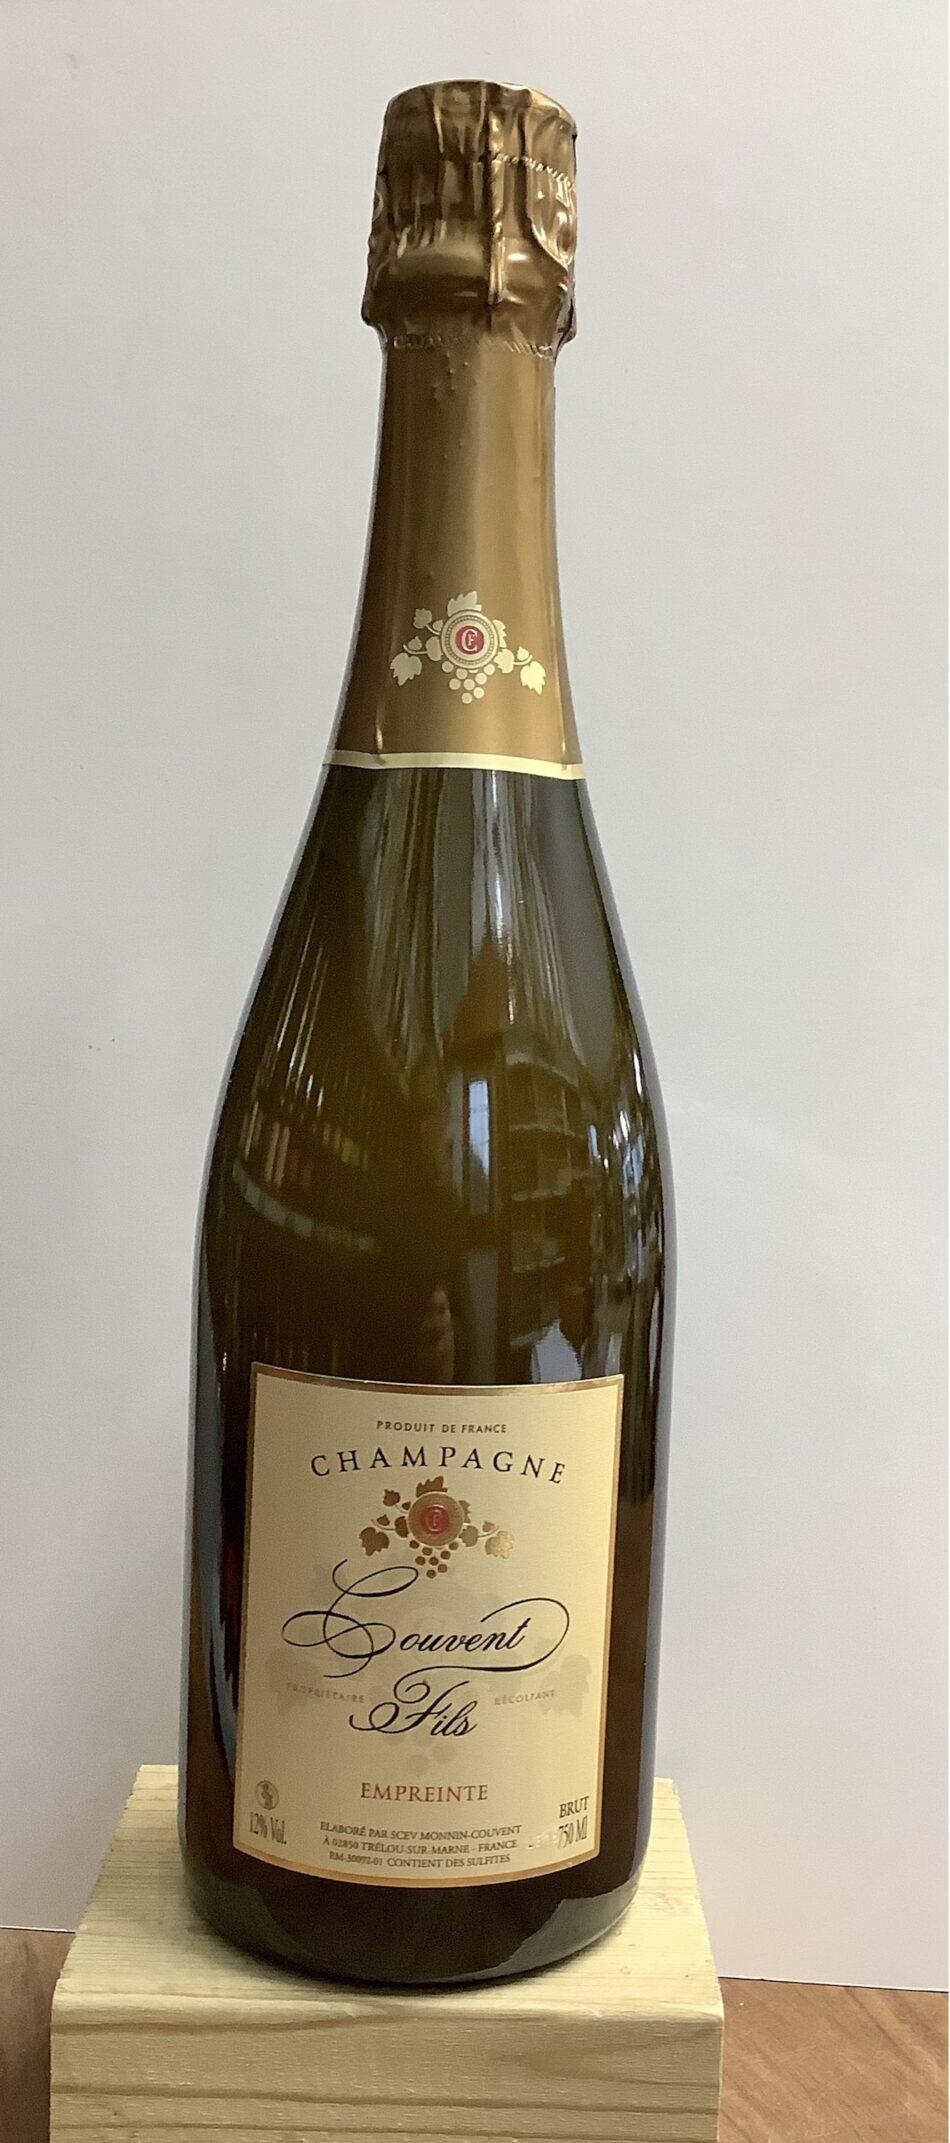 Couvent Fils Empreinte Champagne 1